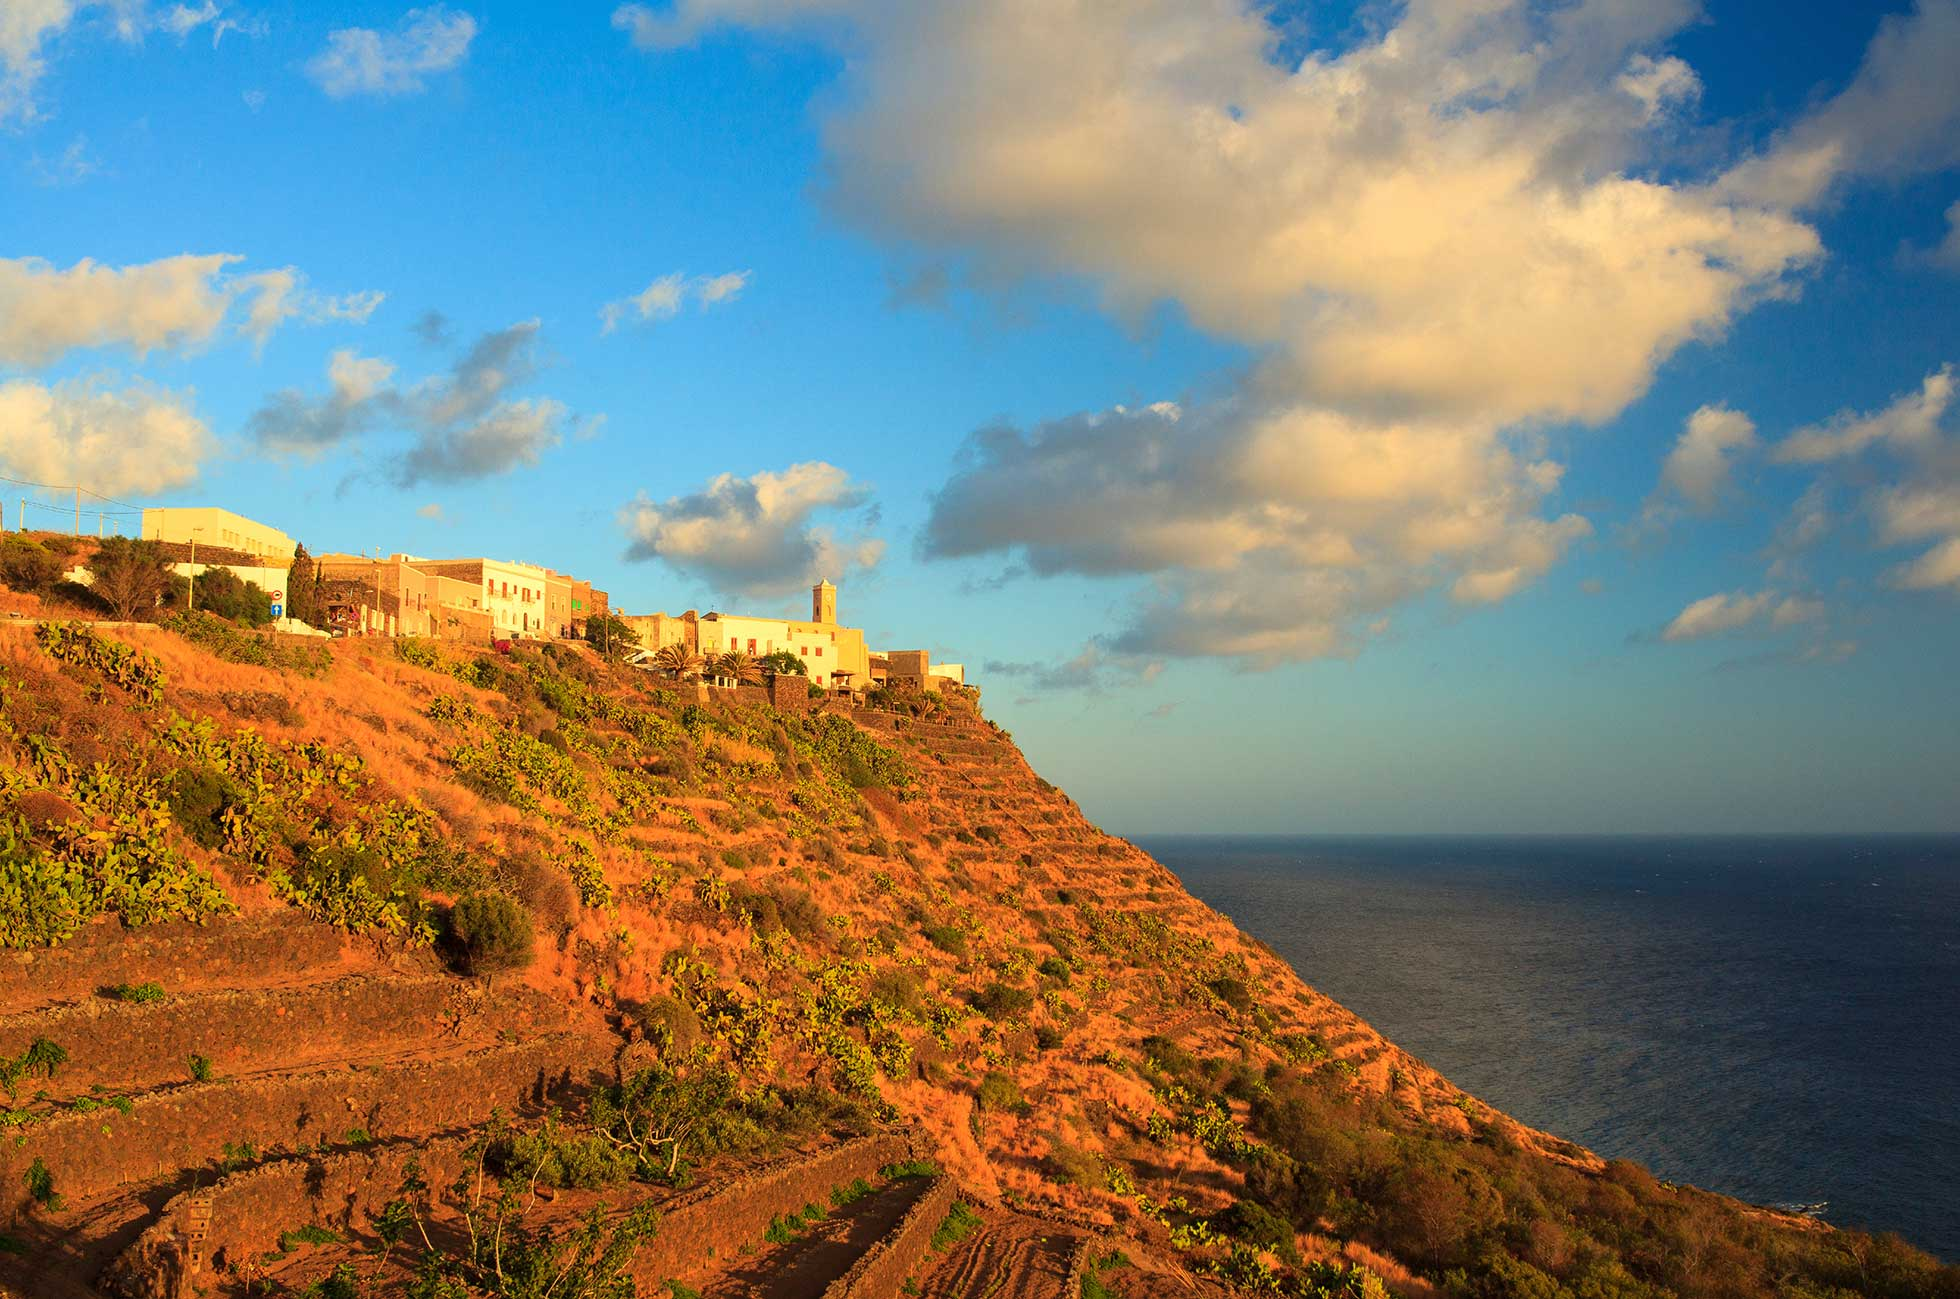 Le Un'isola Abitare Per Tutte Pantelleria Stagioni qUGVpSzM